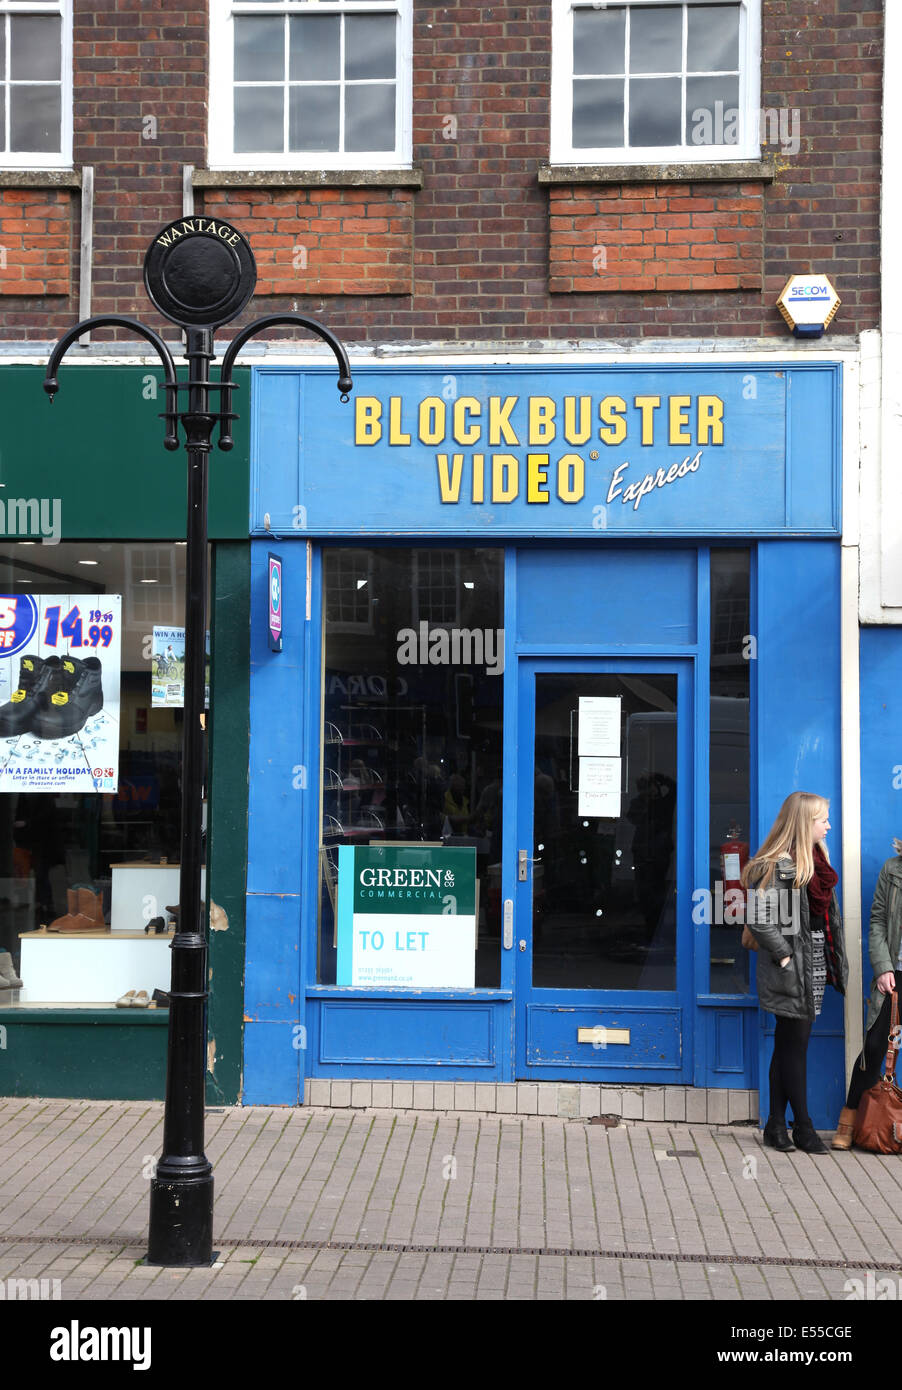 Blockbuster Wantage - Stock Image